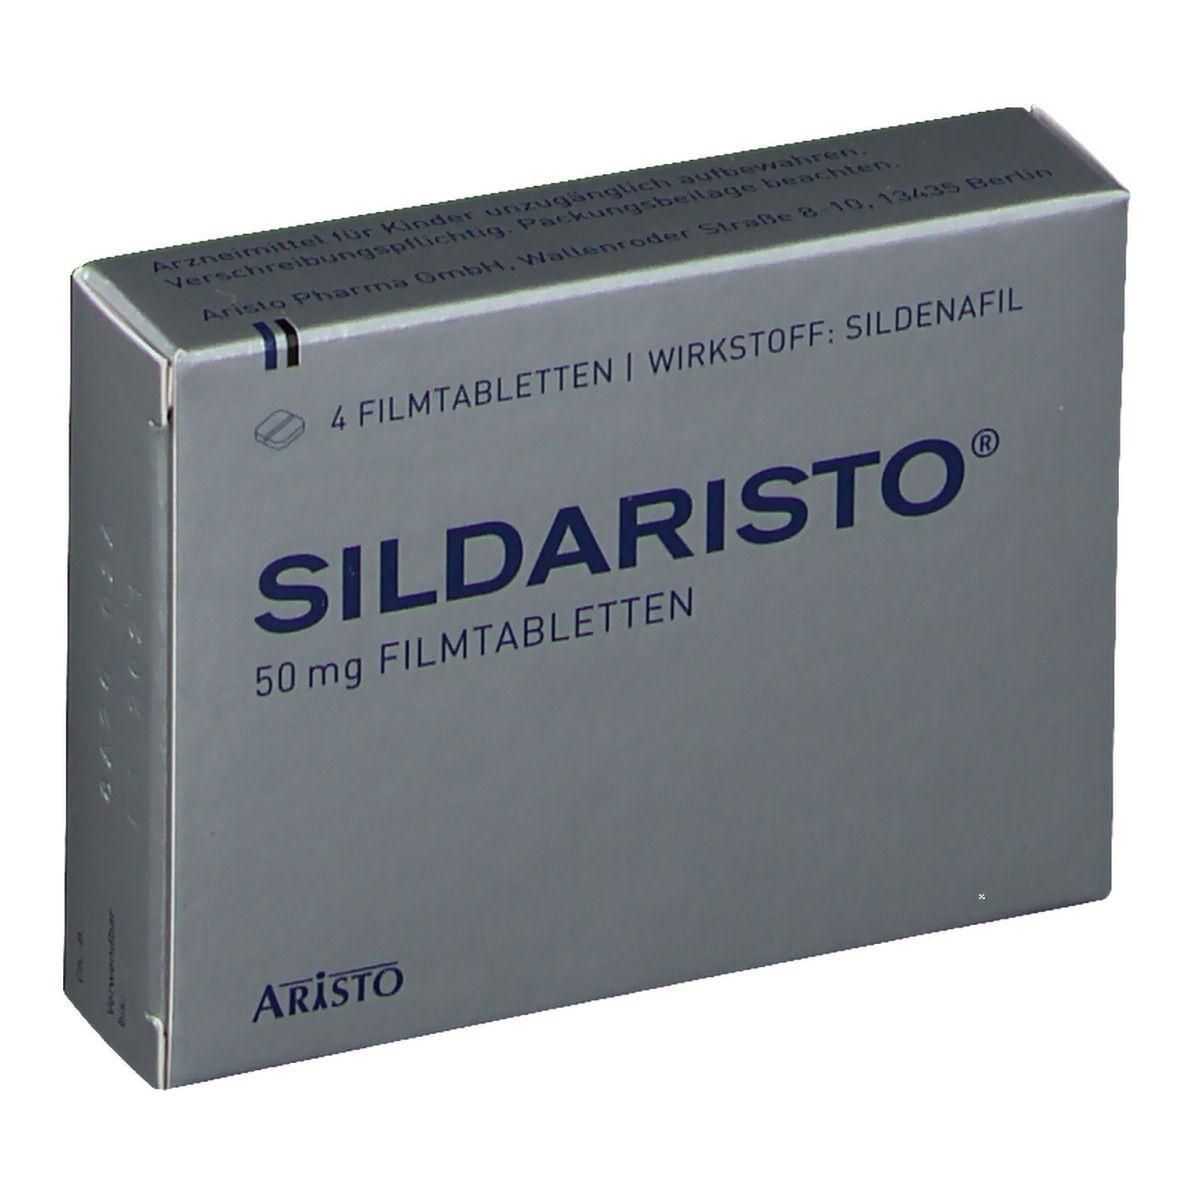 SILDARISTO 50 mg Filmtabletten